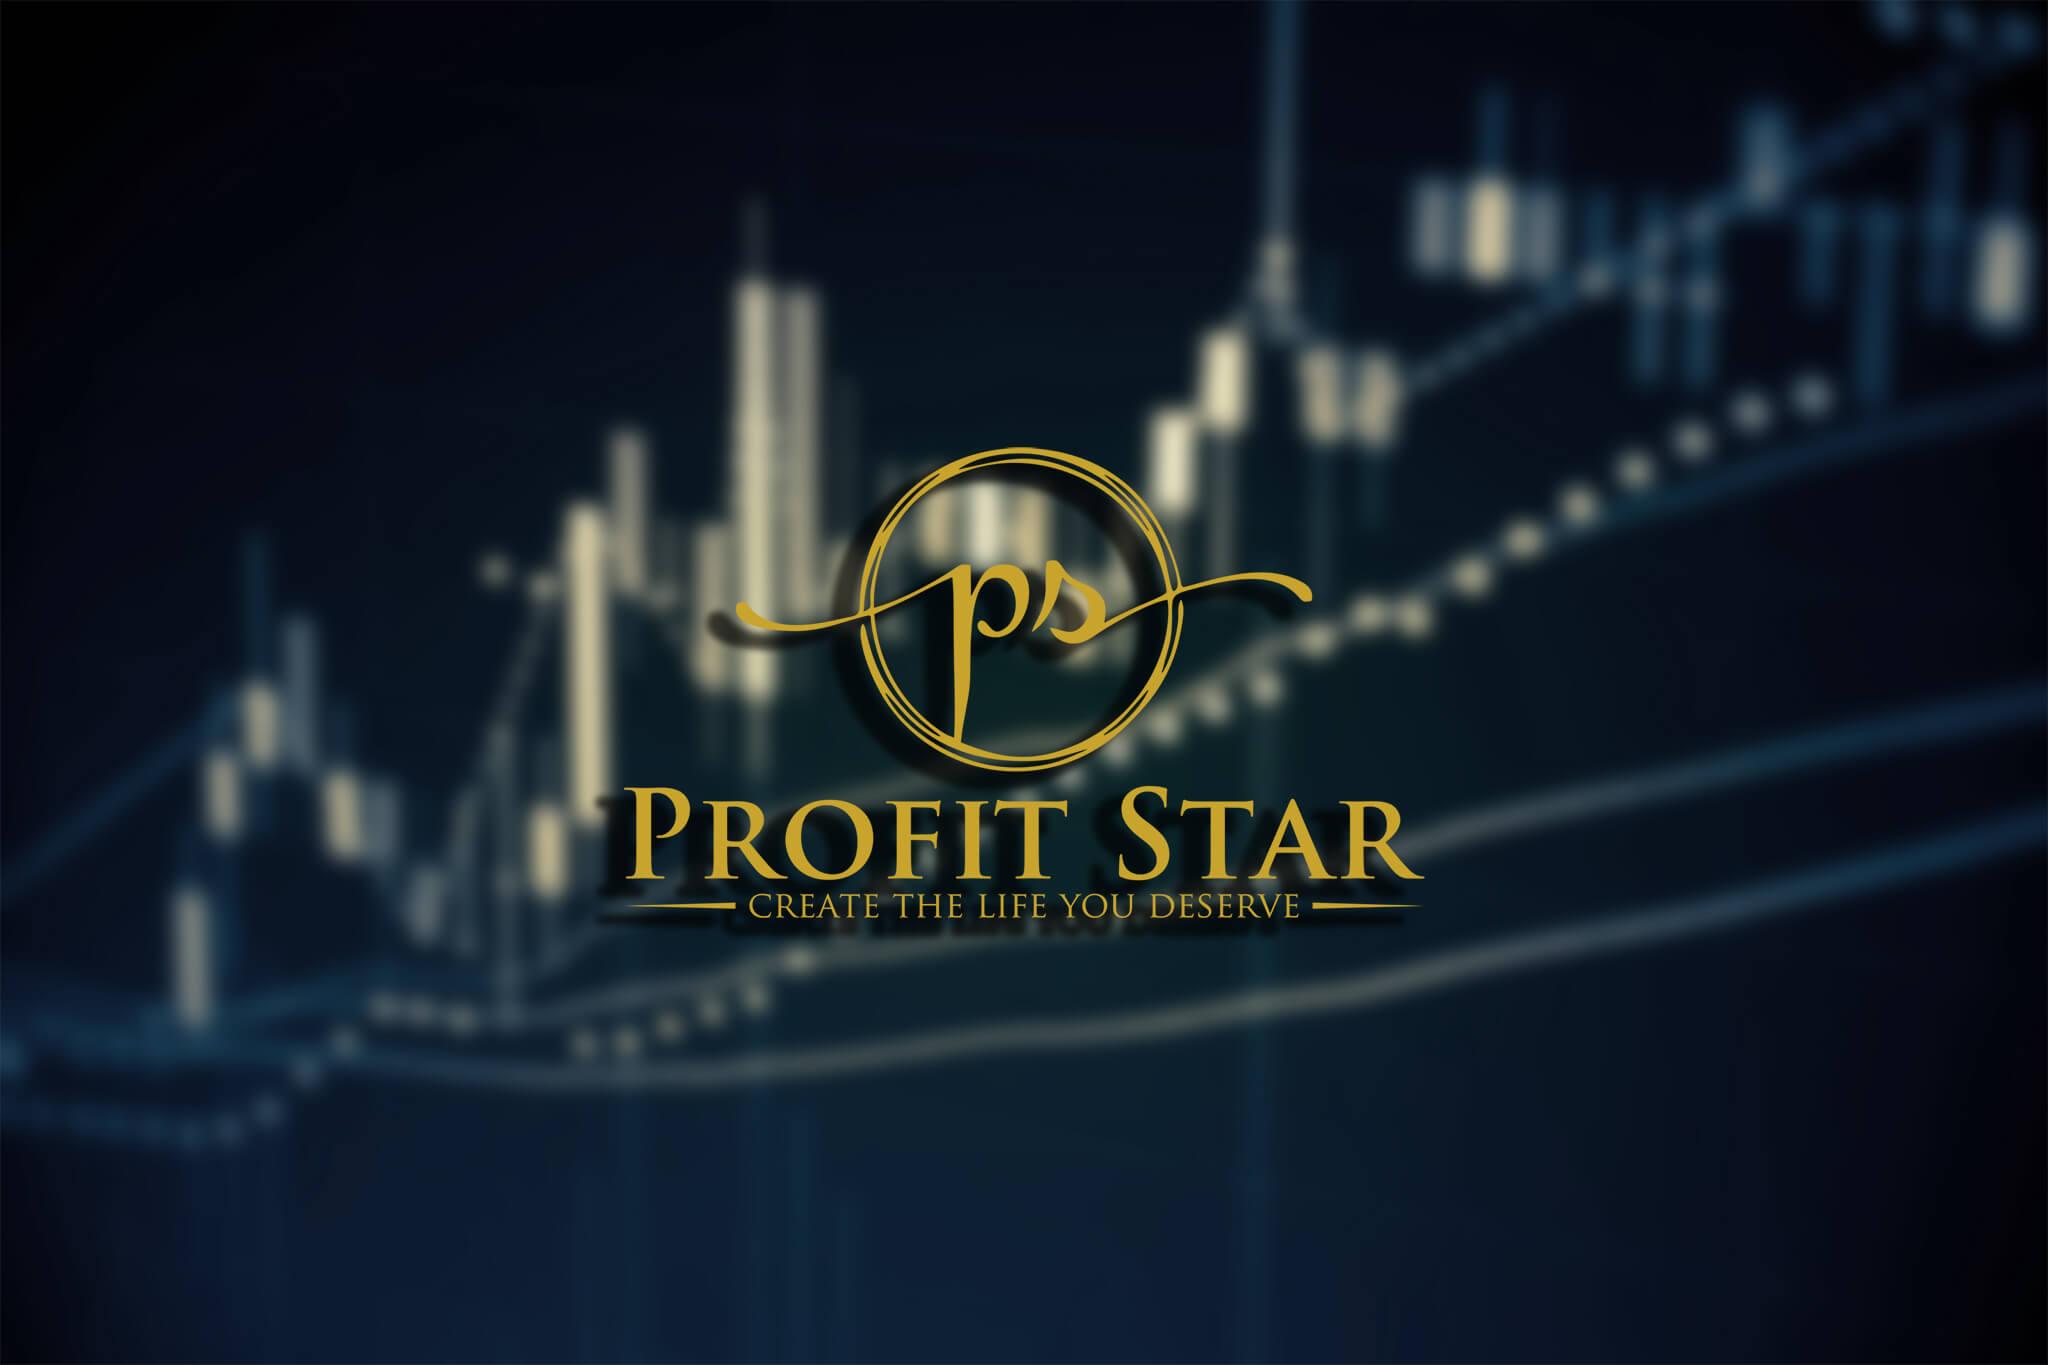 Profit Star educational website